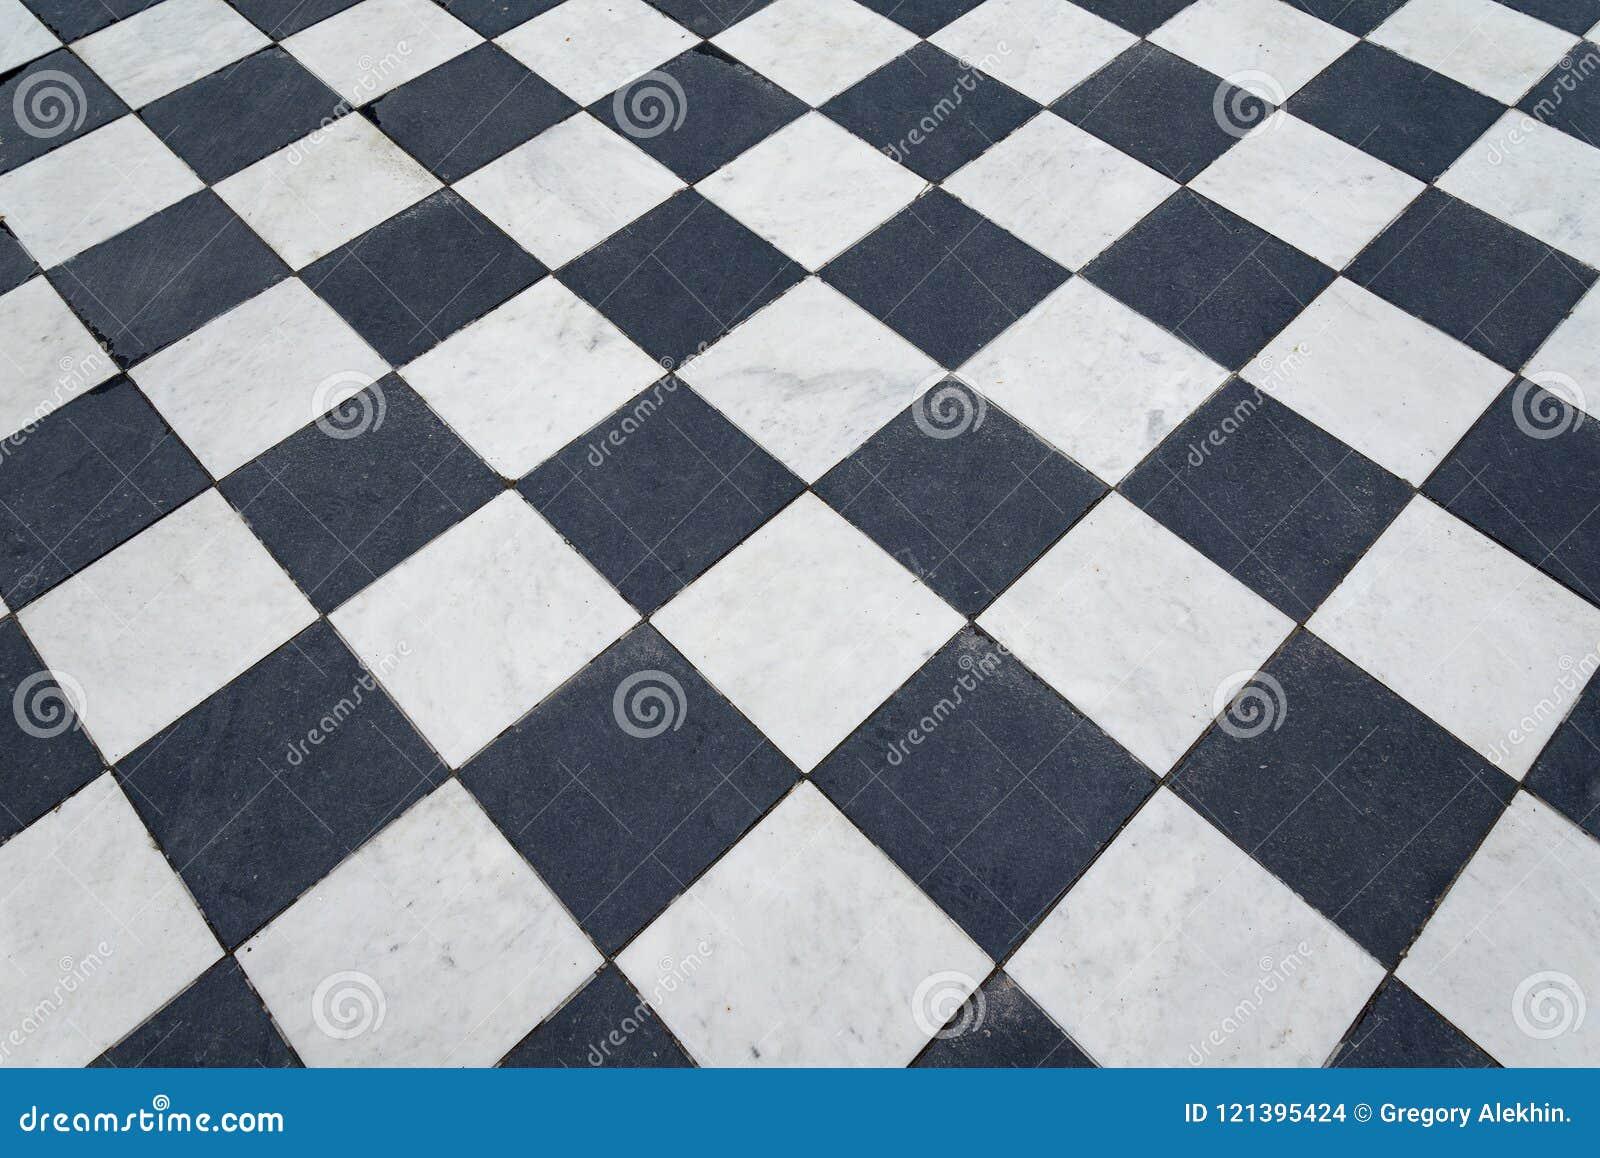 Pavimento a scacchi bianco e nero pavimento a scacchi bianco e